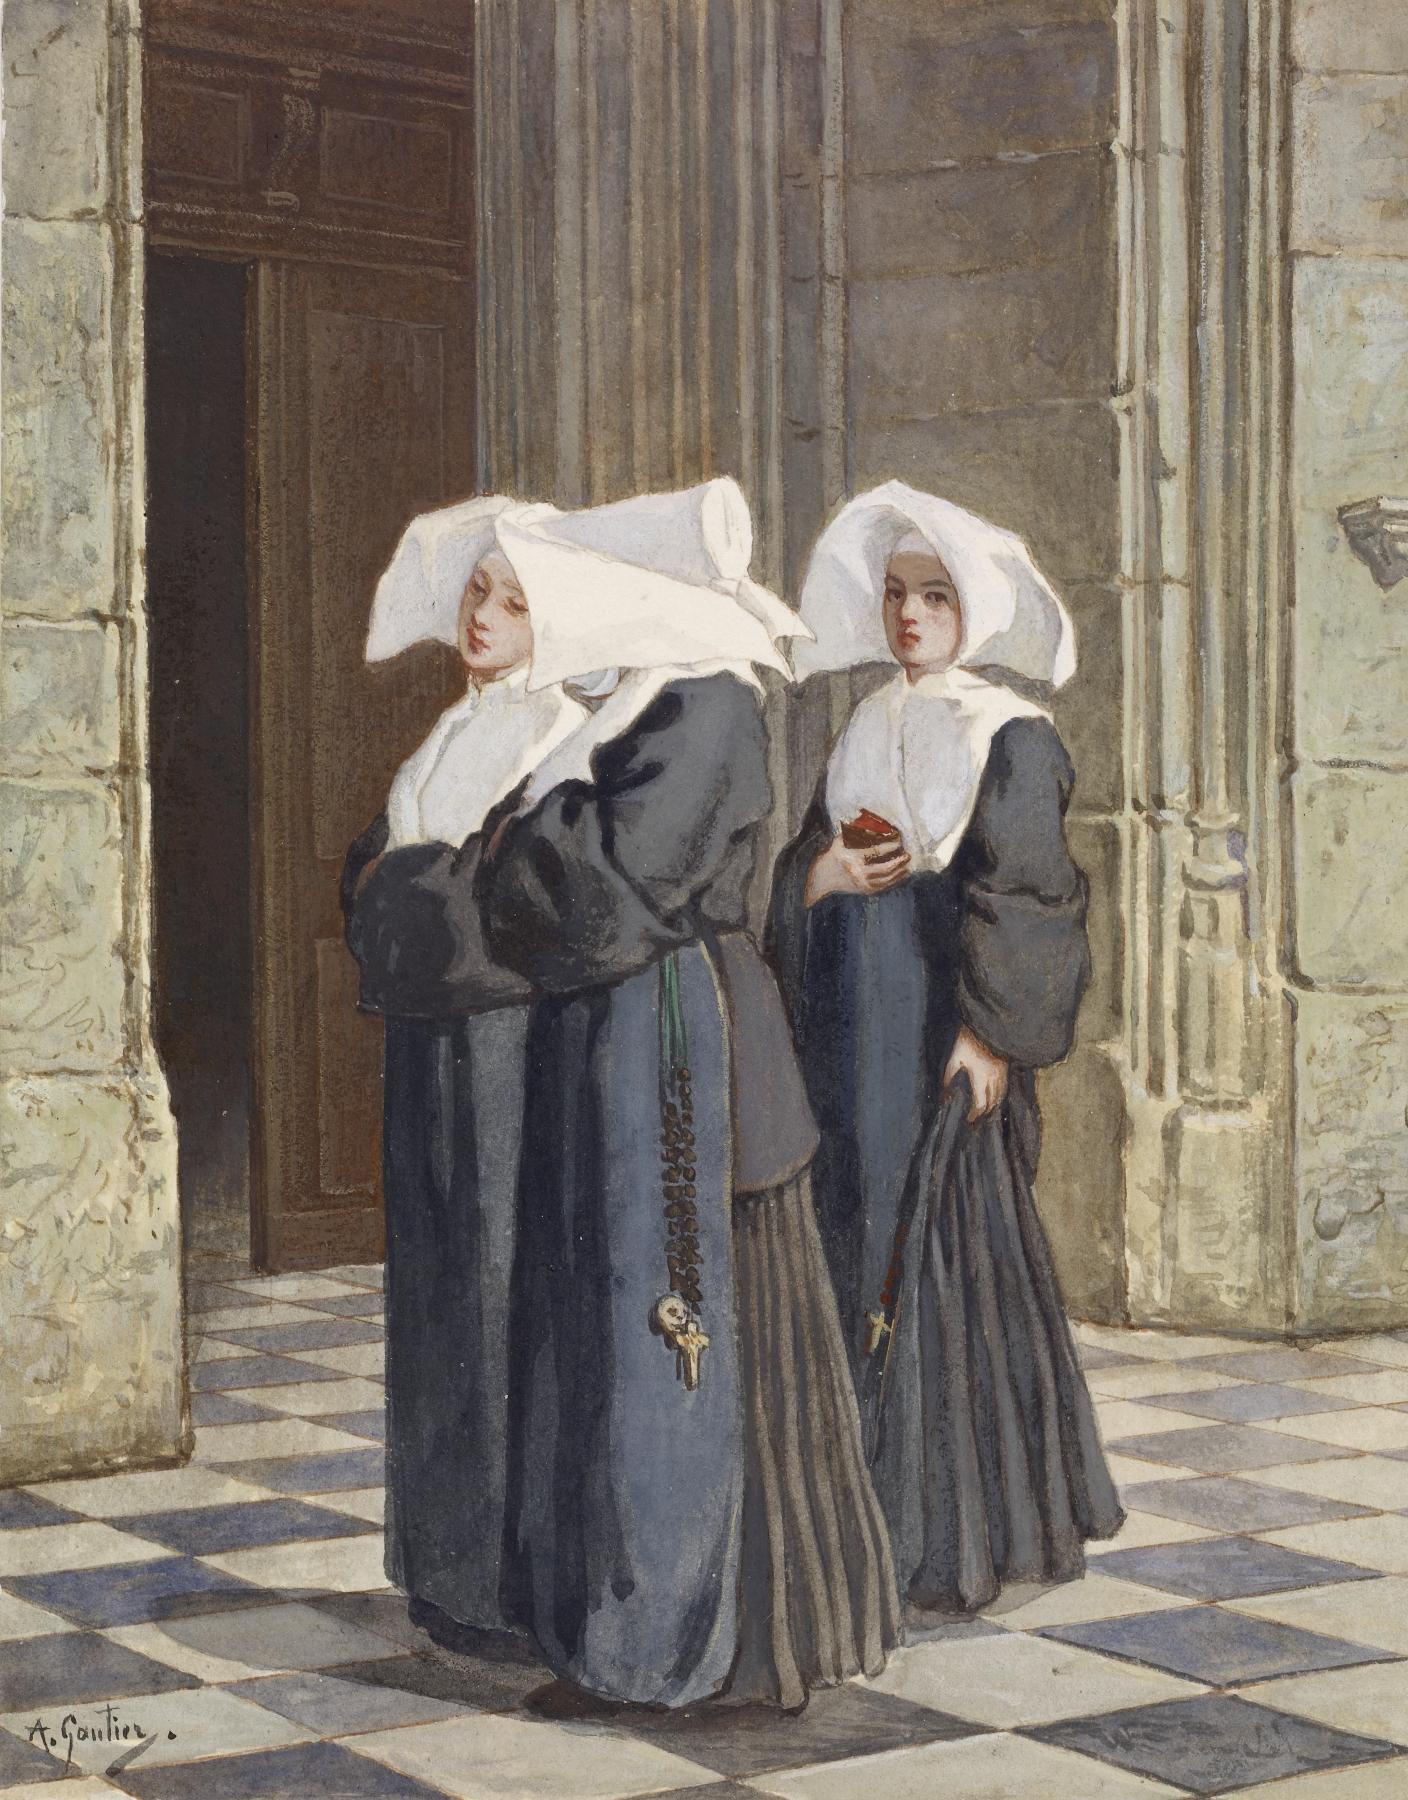 Armand_Gautier_-_Three_Nuns_in_the_Portal_of_a_Church_-_Walters_371383